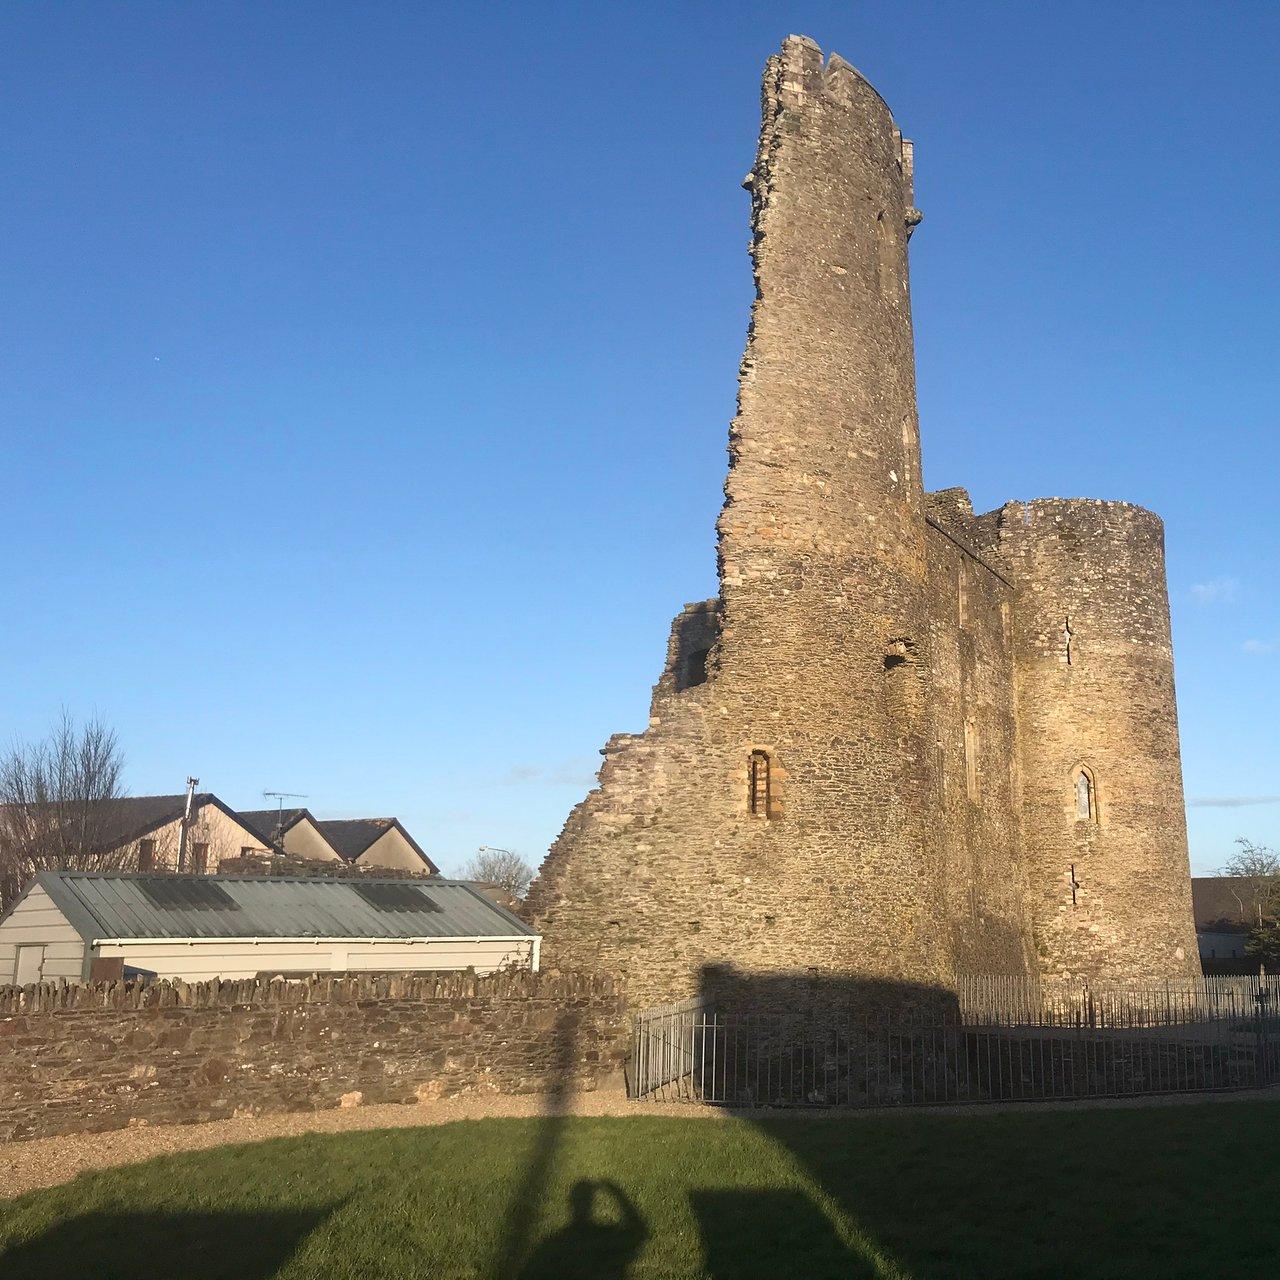 Enniscorthy Castle | | UPDATED June 2020 Top Tips Before